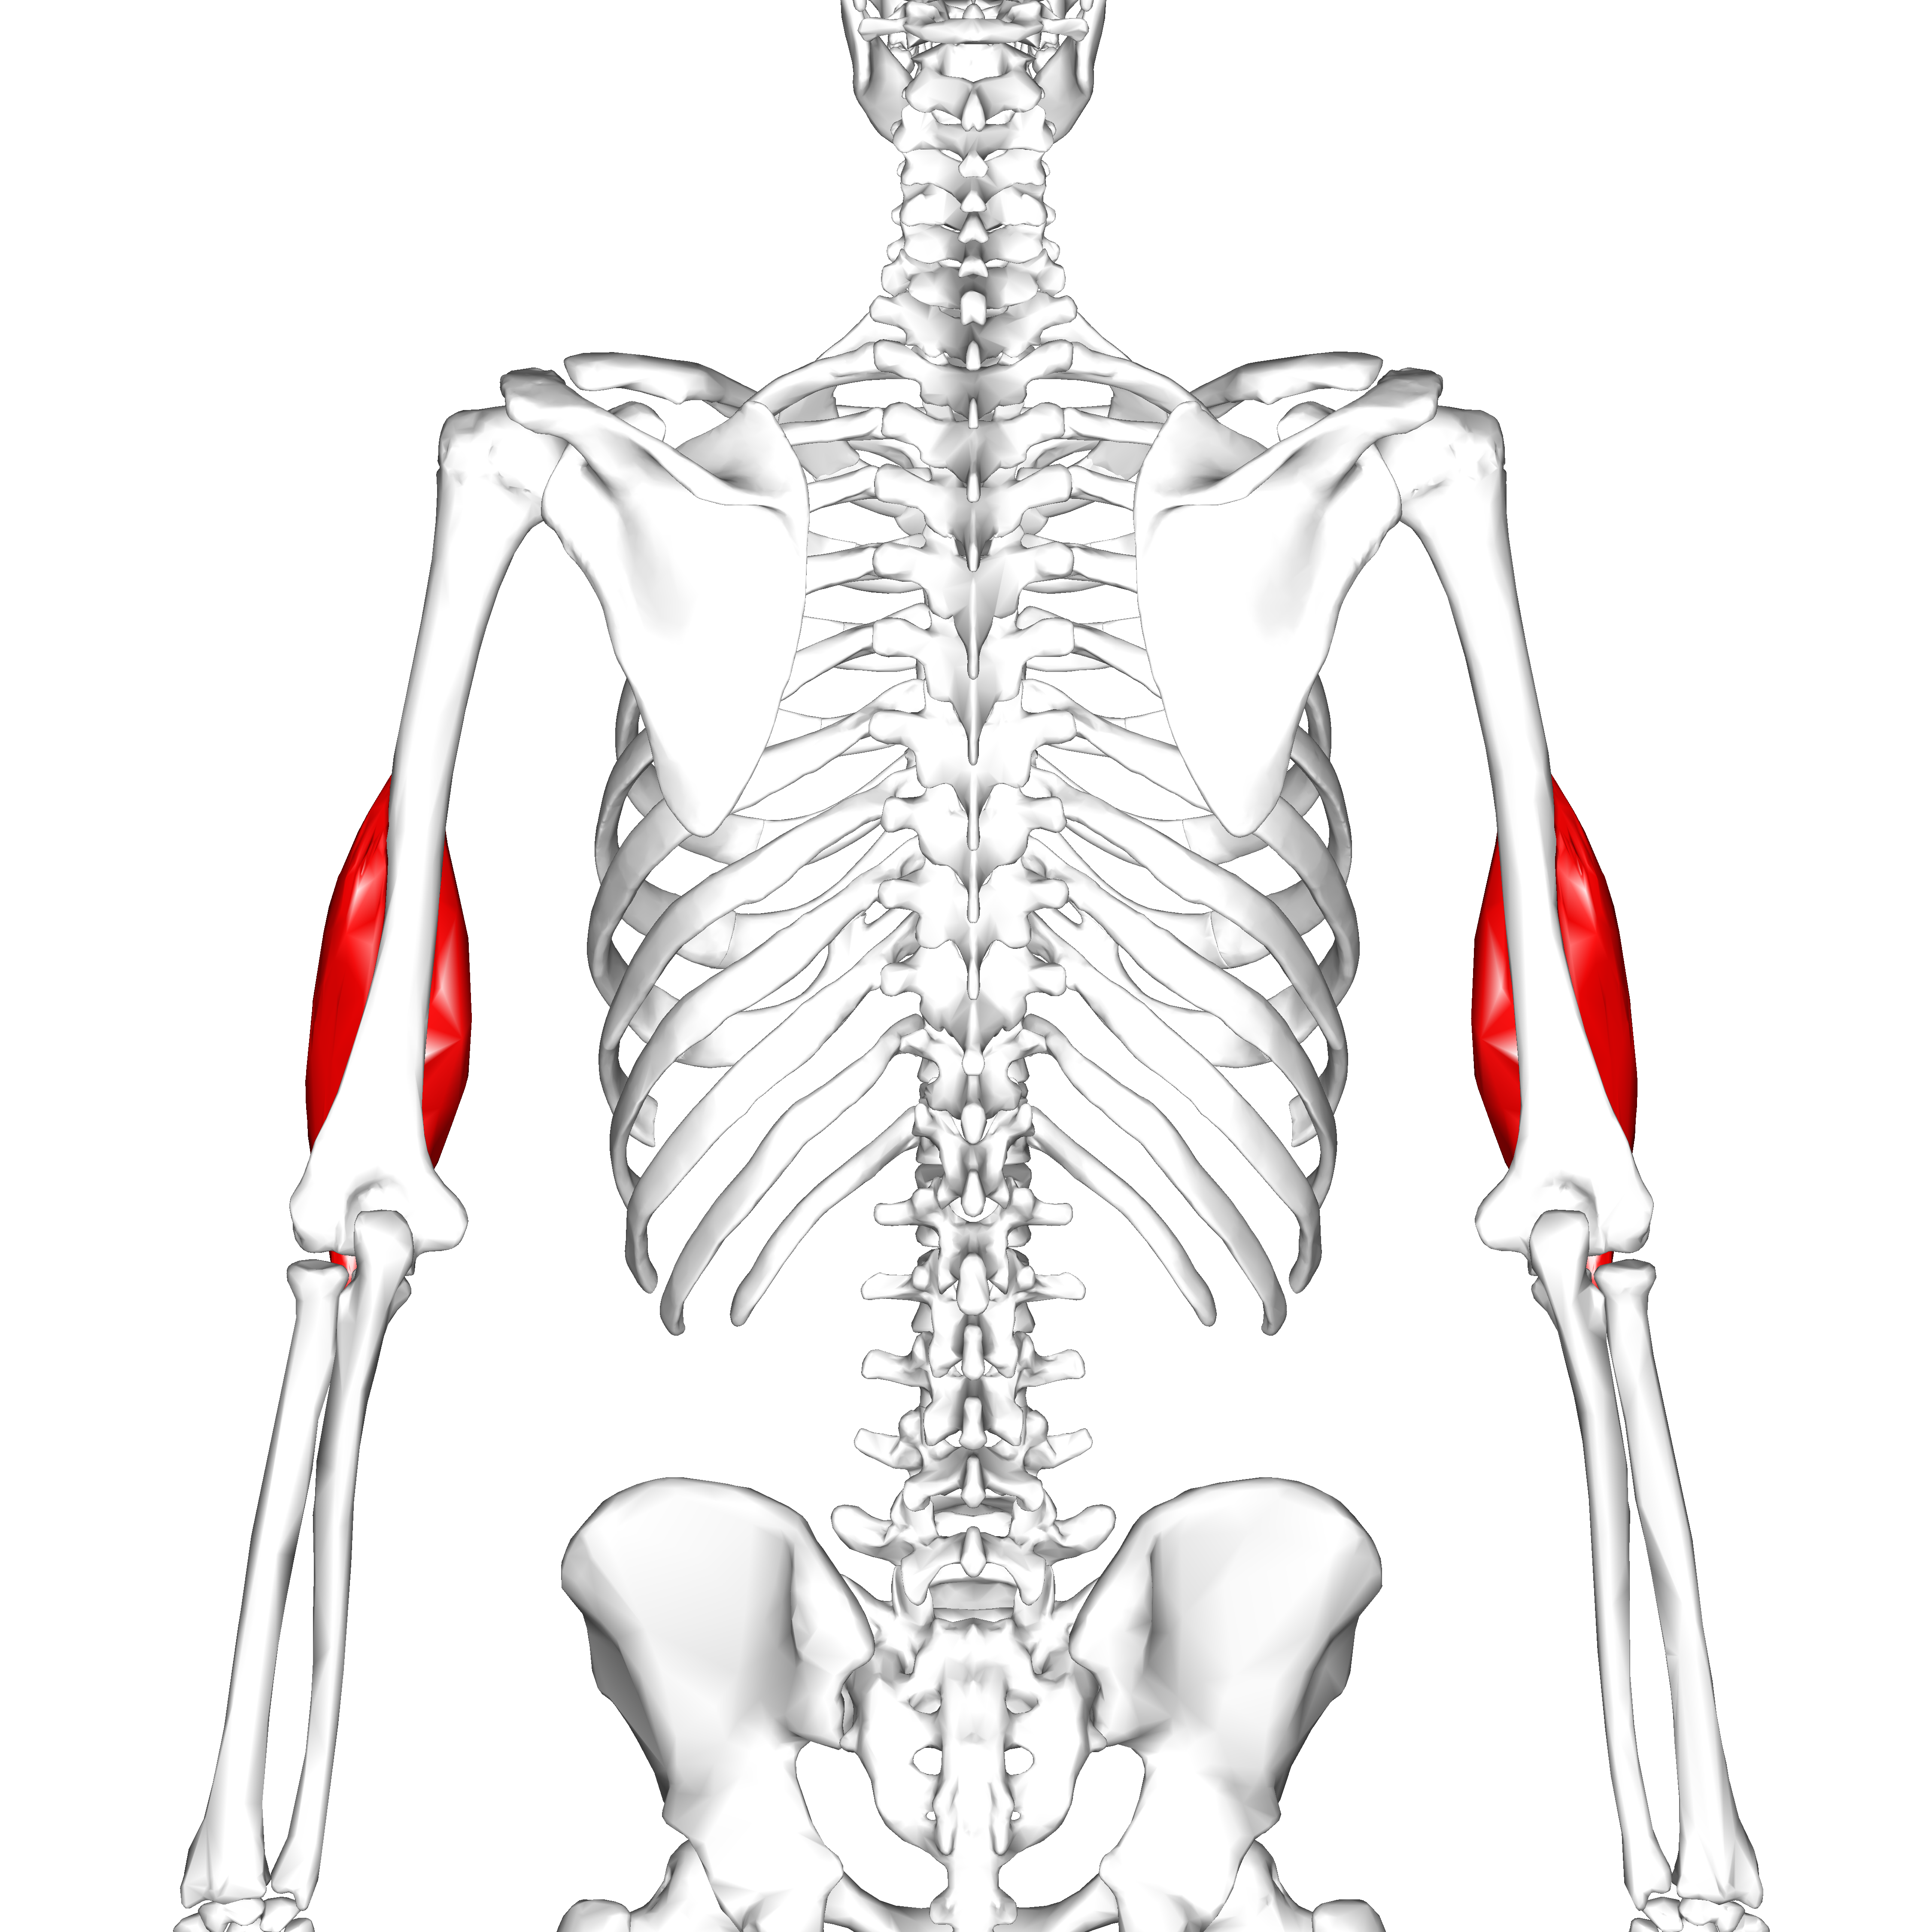 File:Brachialis muscle05.png - Wikimedia Commons